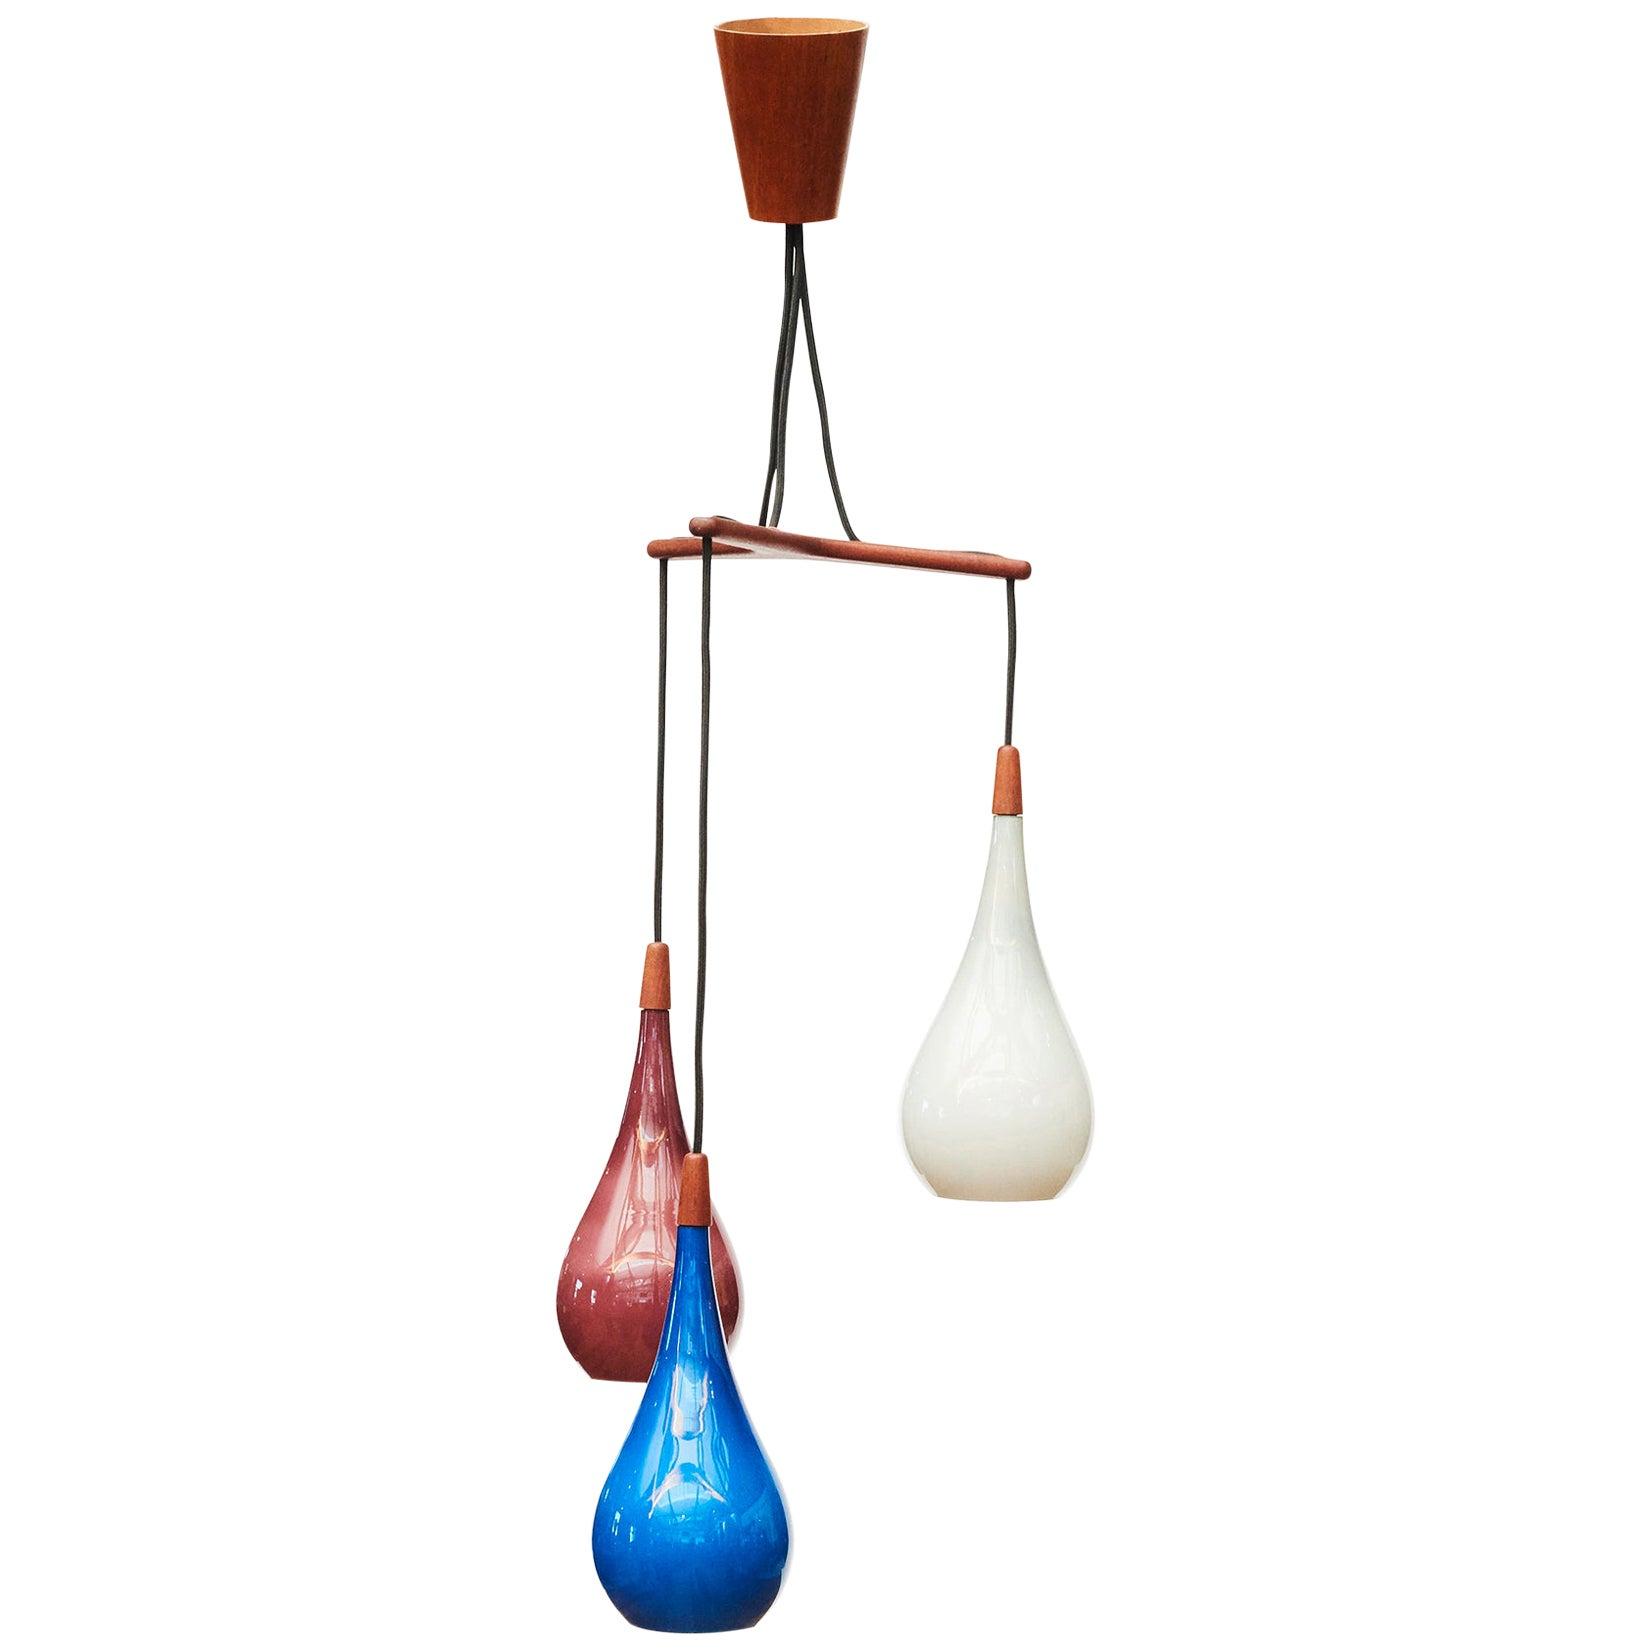 Glass and Teak  Pendant Light, Danish Design, Holmegaard, circa 1955